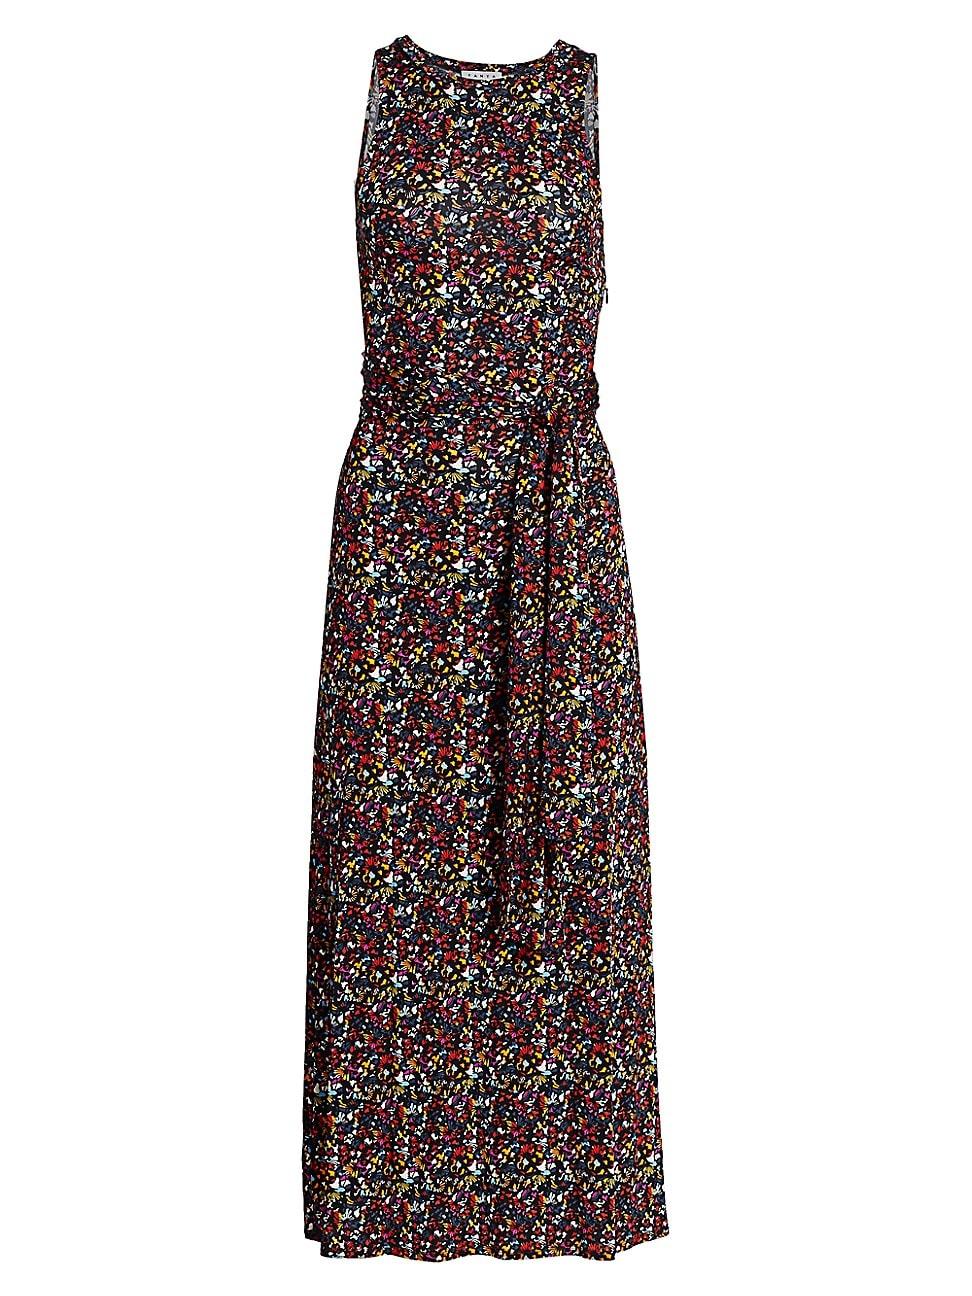 Tanya Taylor Octavia Printed Tie-back Long Dress In Confetti Small Black